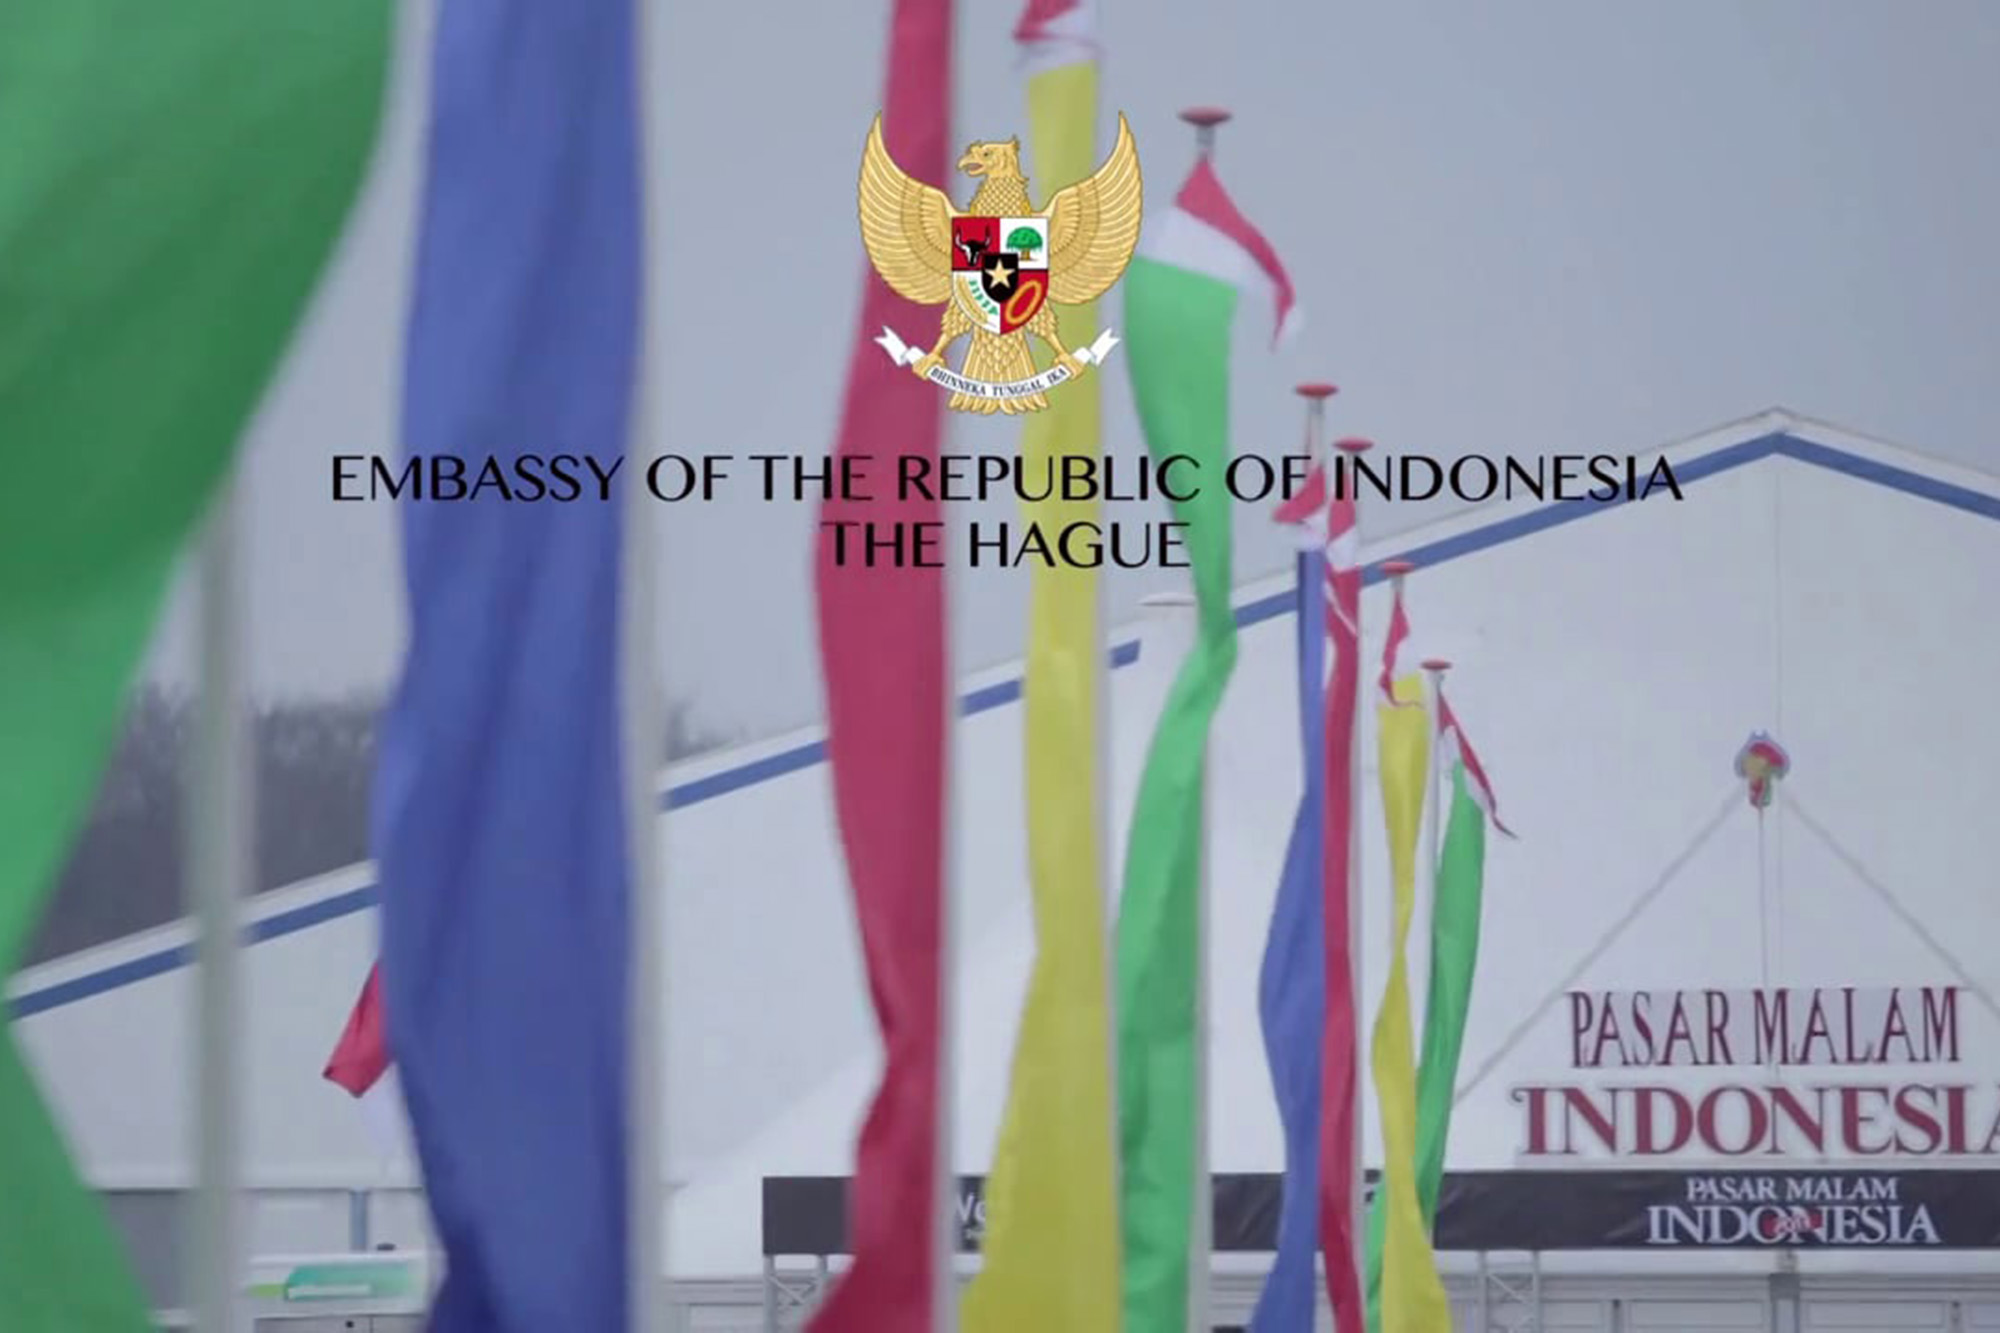 Pasar Malam Indonesia 2013